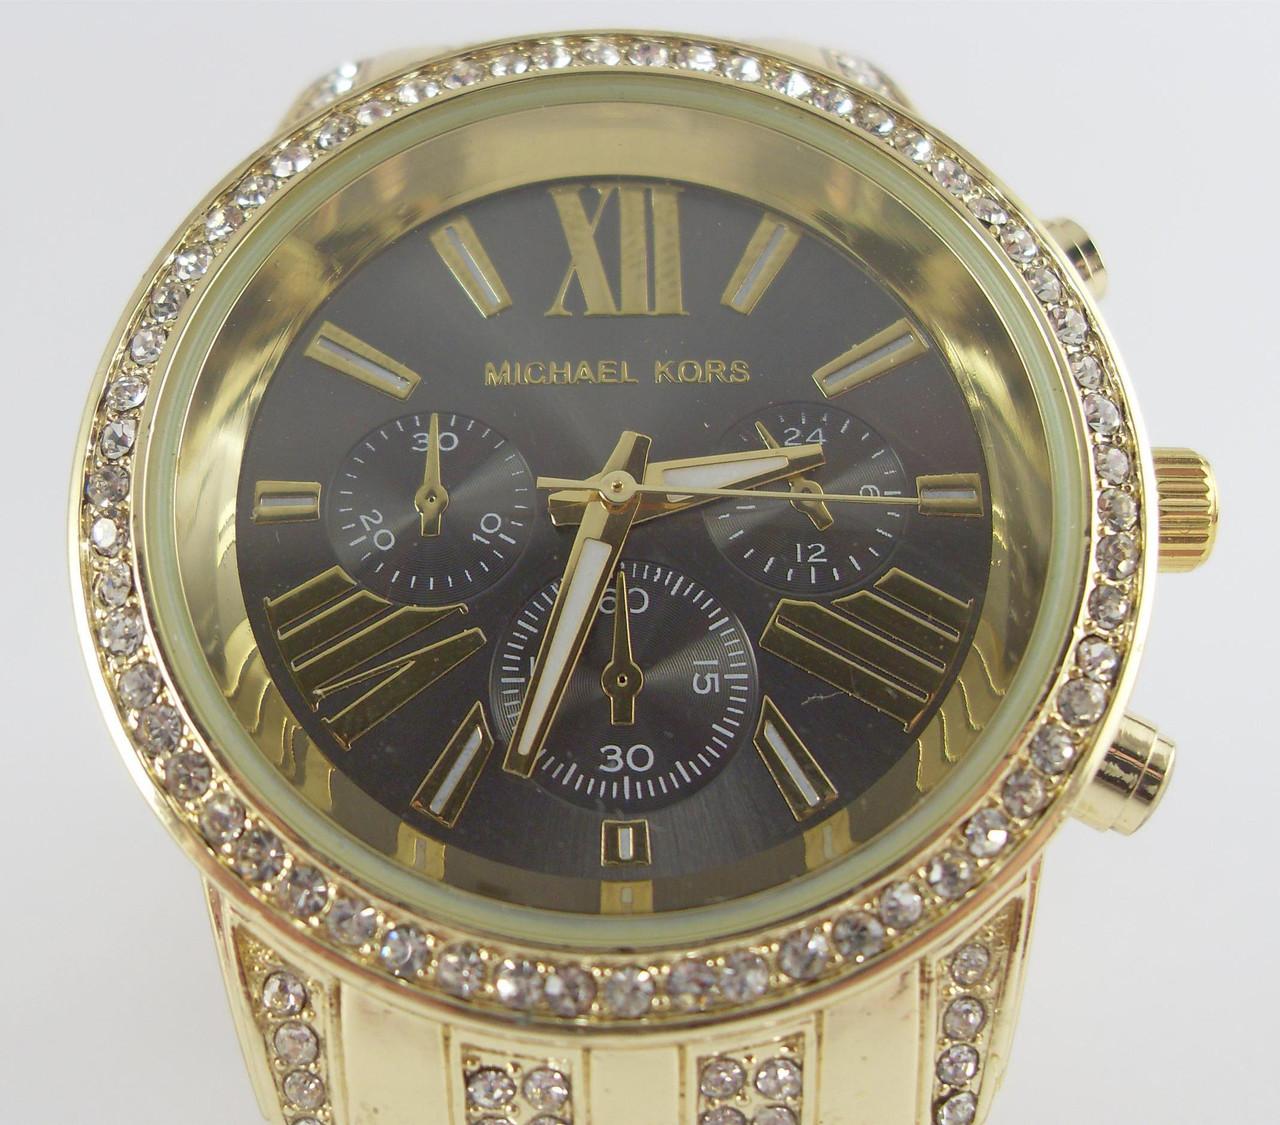 95e2796e8348 Часы Michael Kors MK-632 женские золото стразы недорого. Цена со склада.